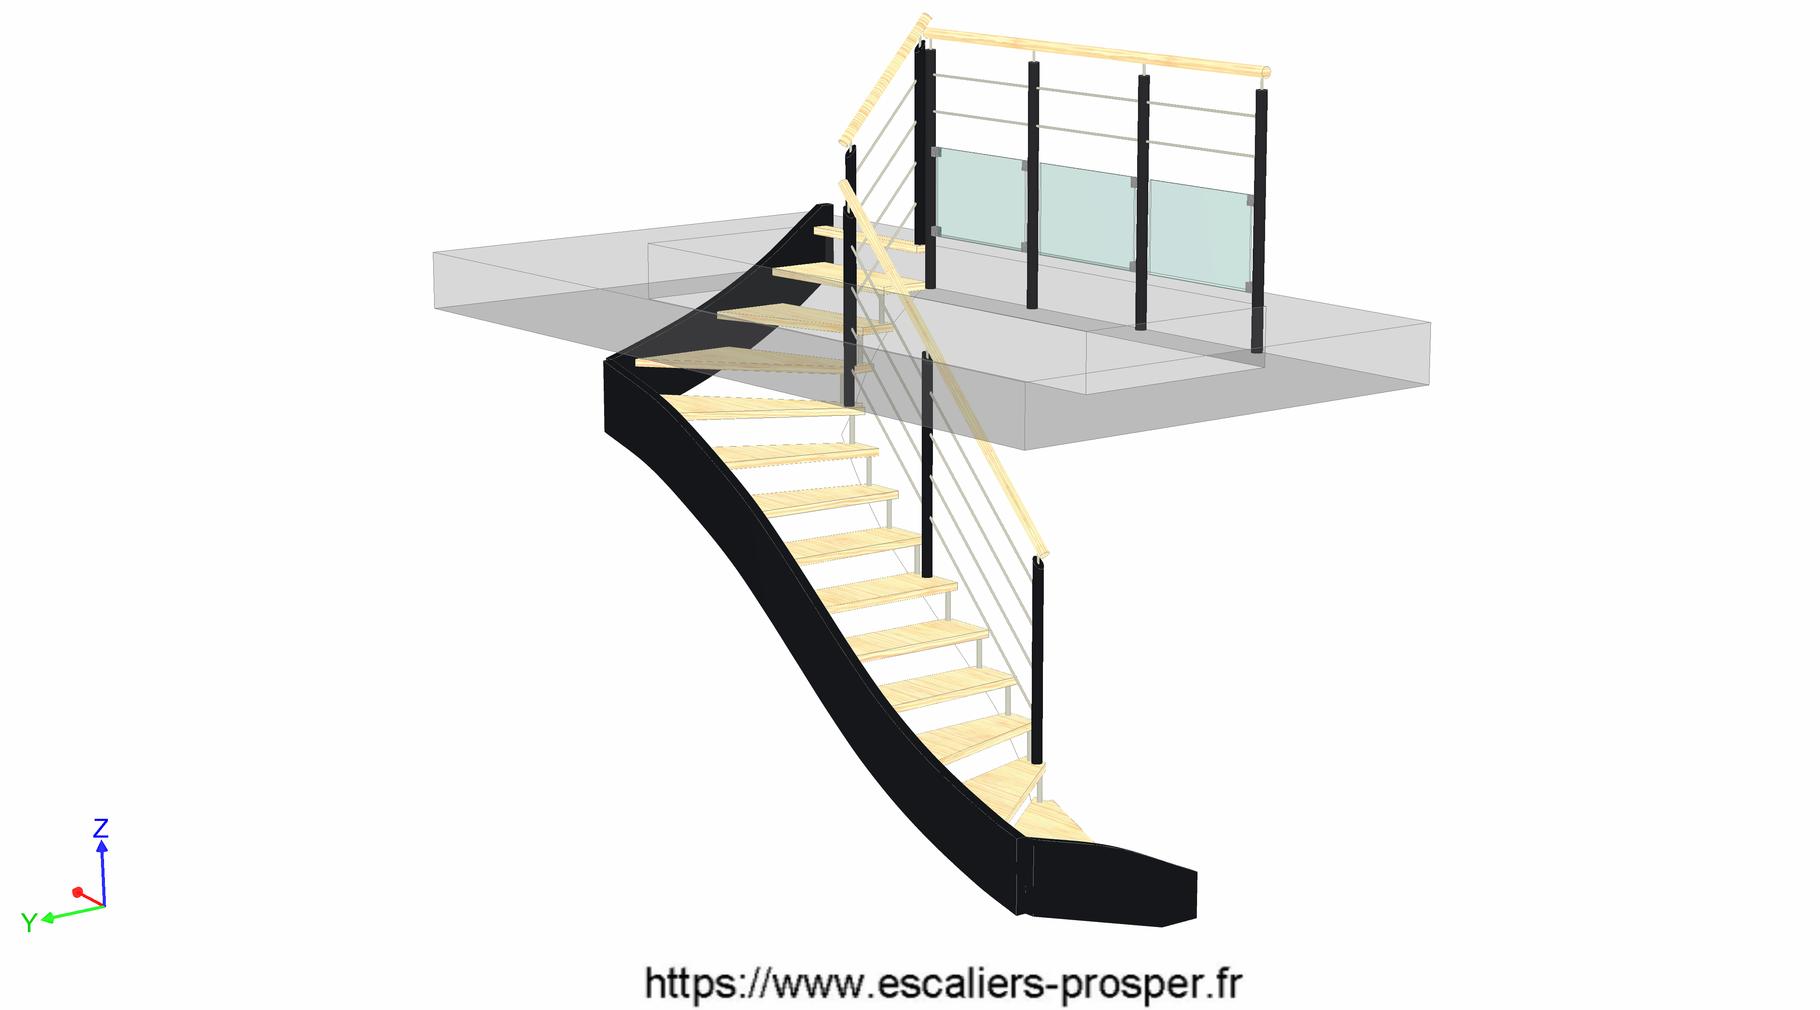 escalier en u suspendu e15 171 sd r1 escaliers prosper sp cialiste de la conception la pose. Black Bedroom Furniture Sets. Home Design Ideas